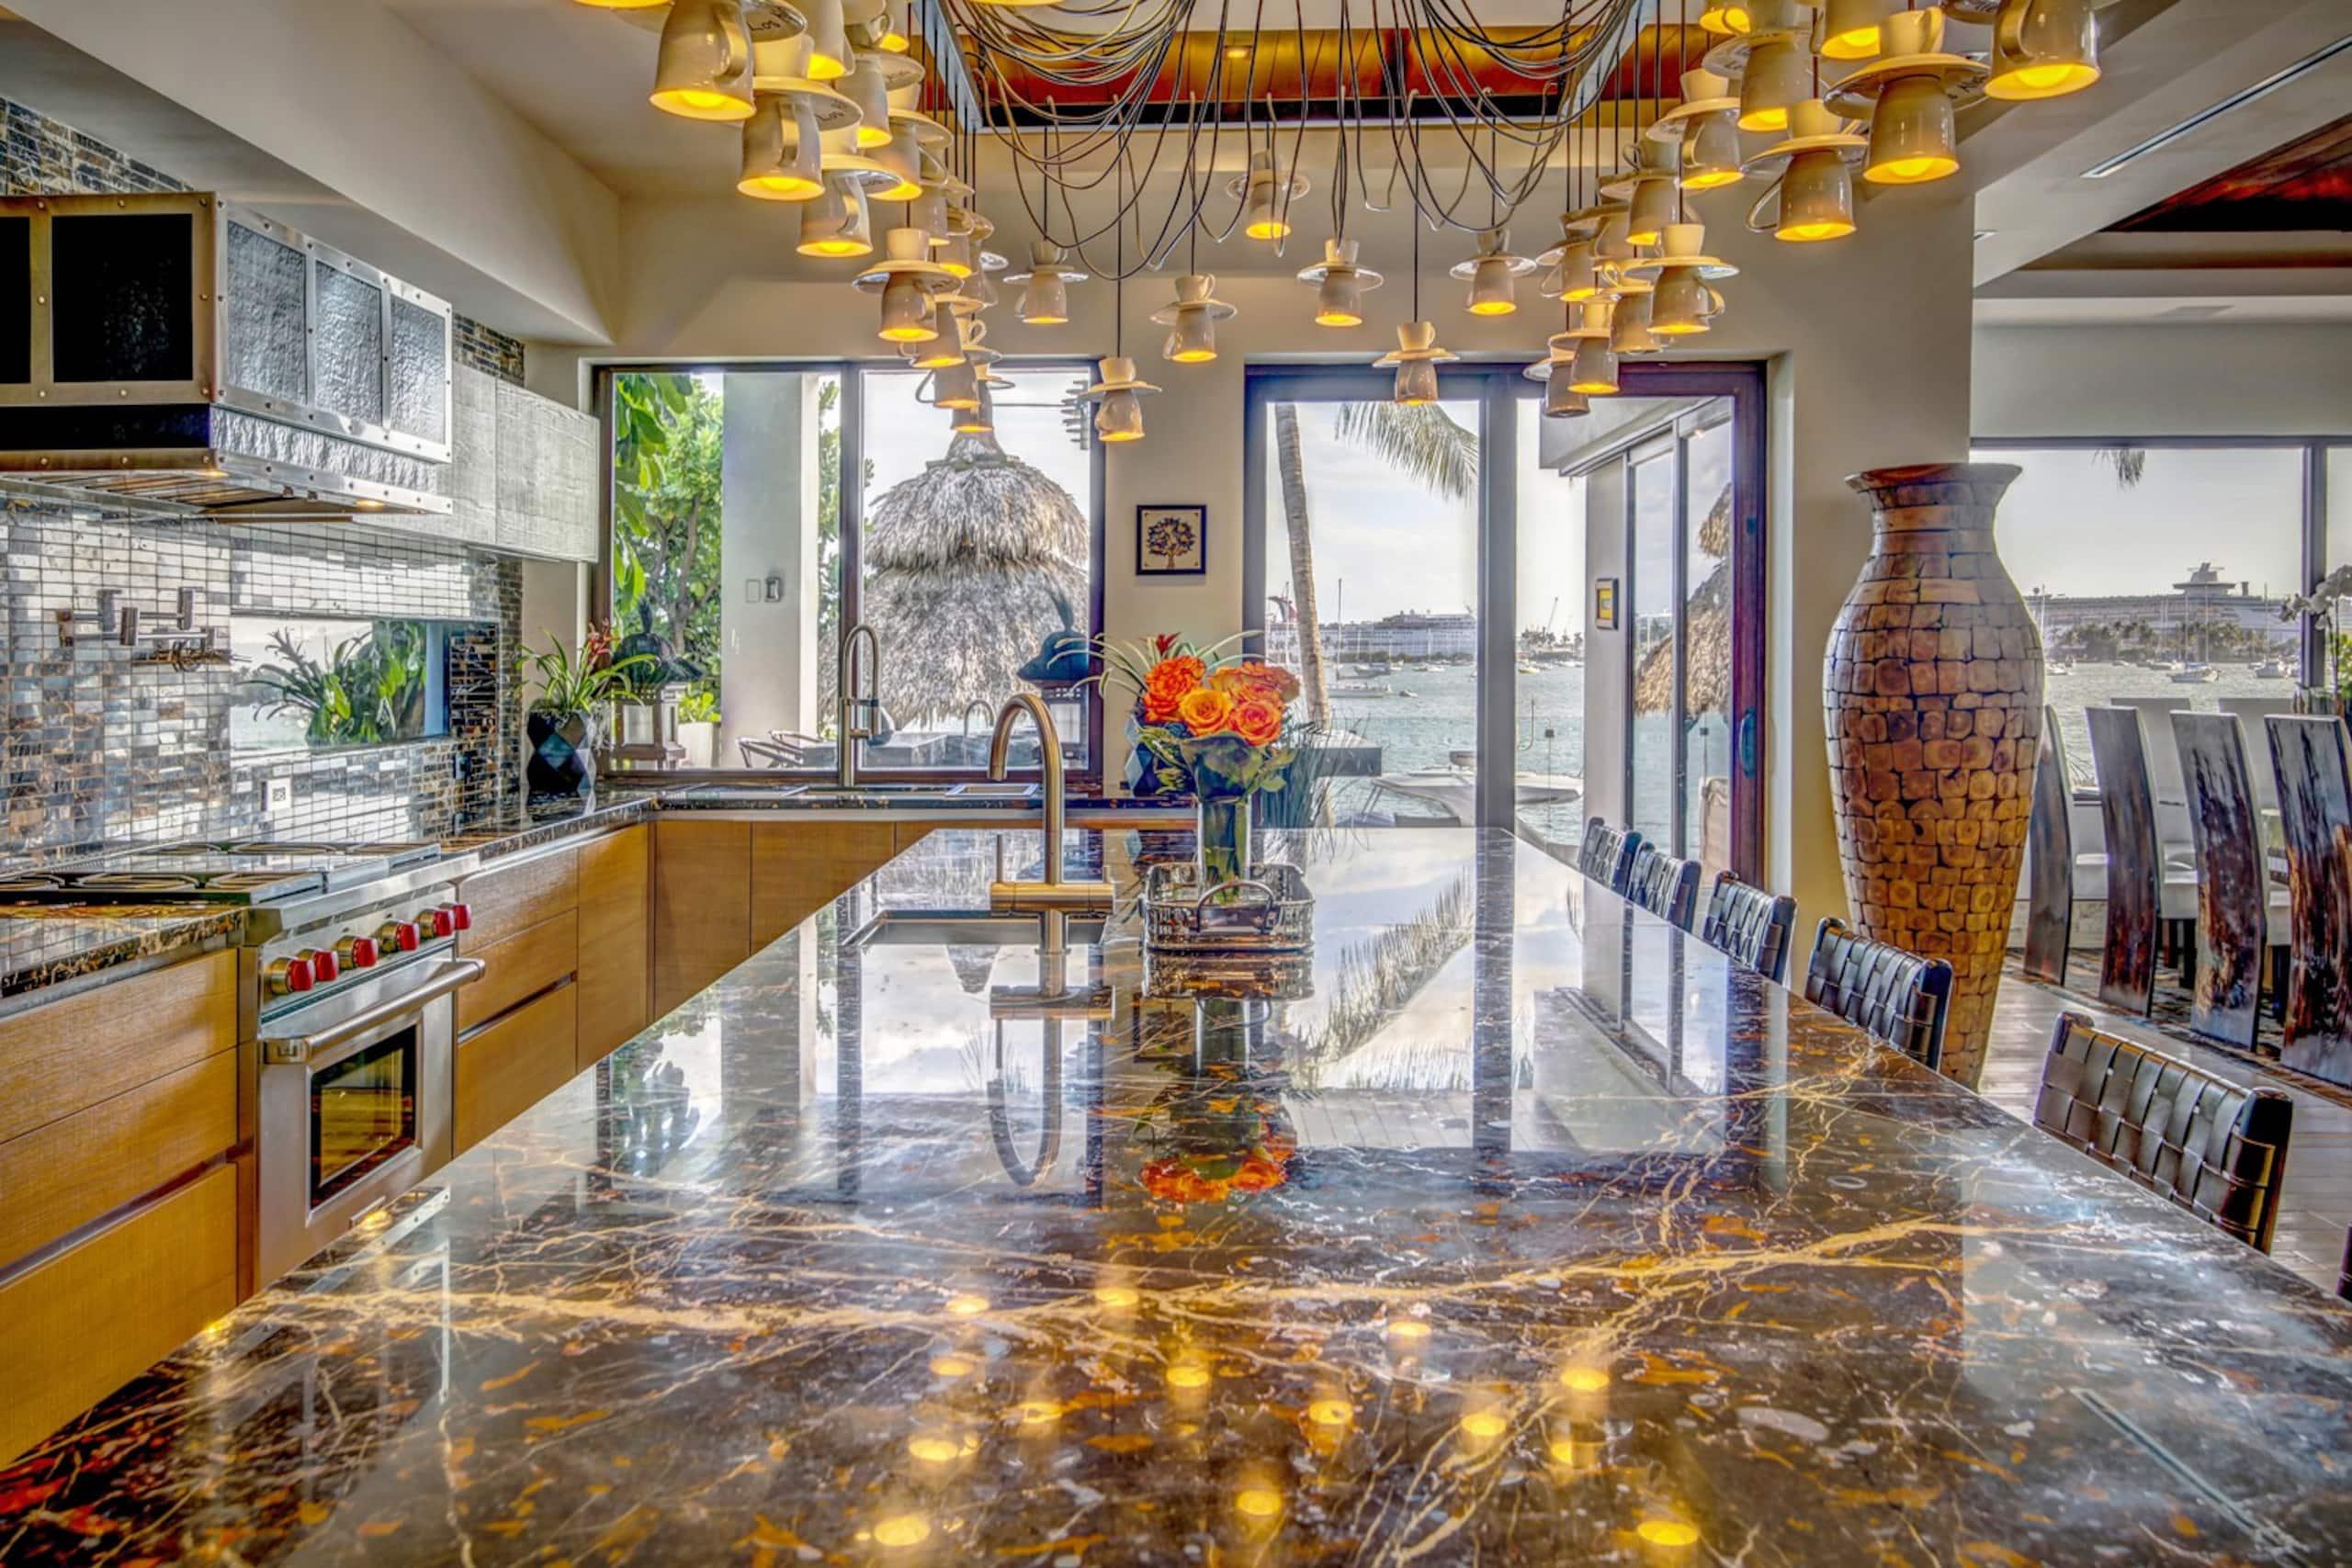 Apartment Villa Riza - Magnificent Balinese-style photo 20185479